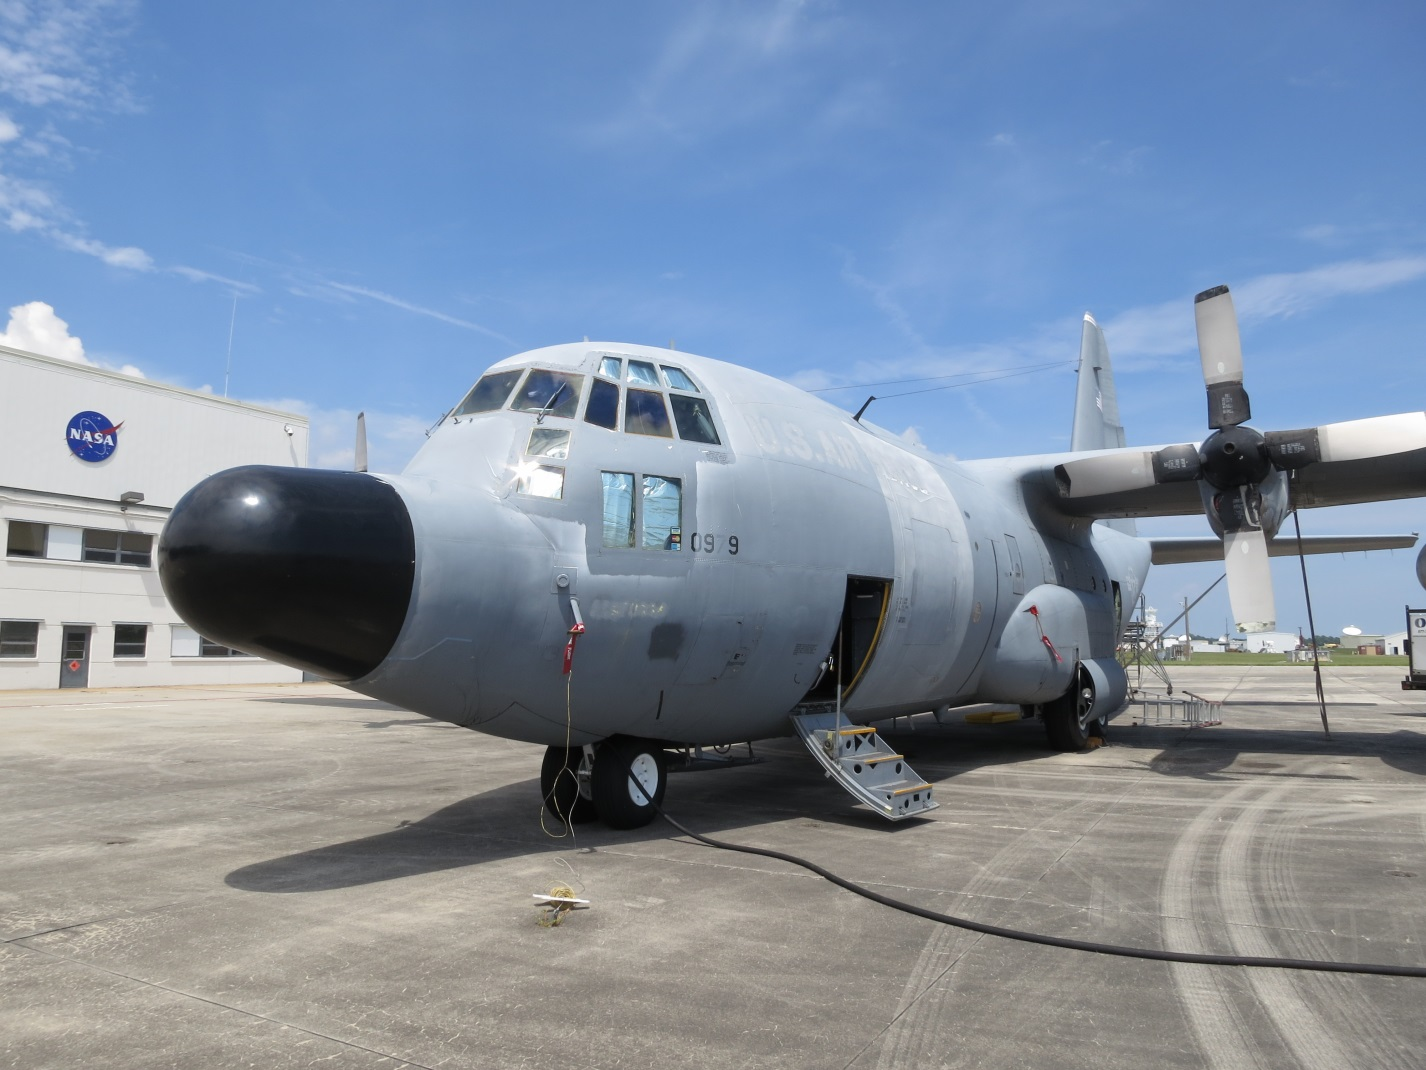 NASA C-130, Global Hawk Take on Ice